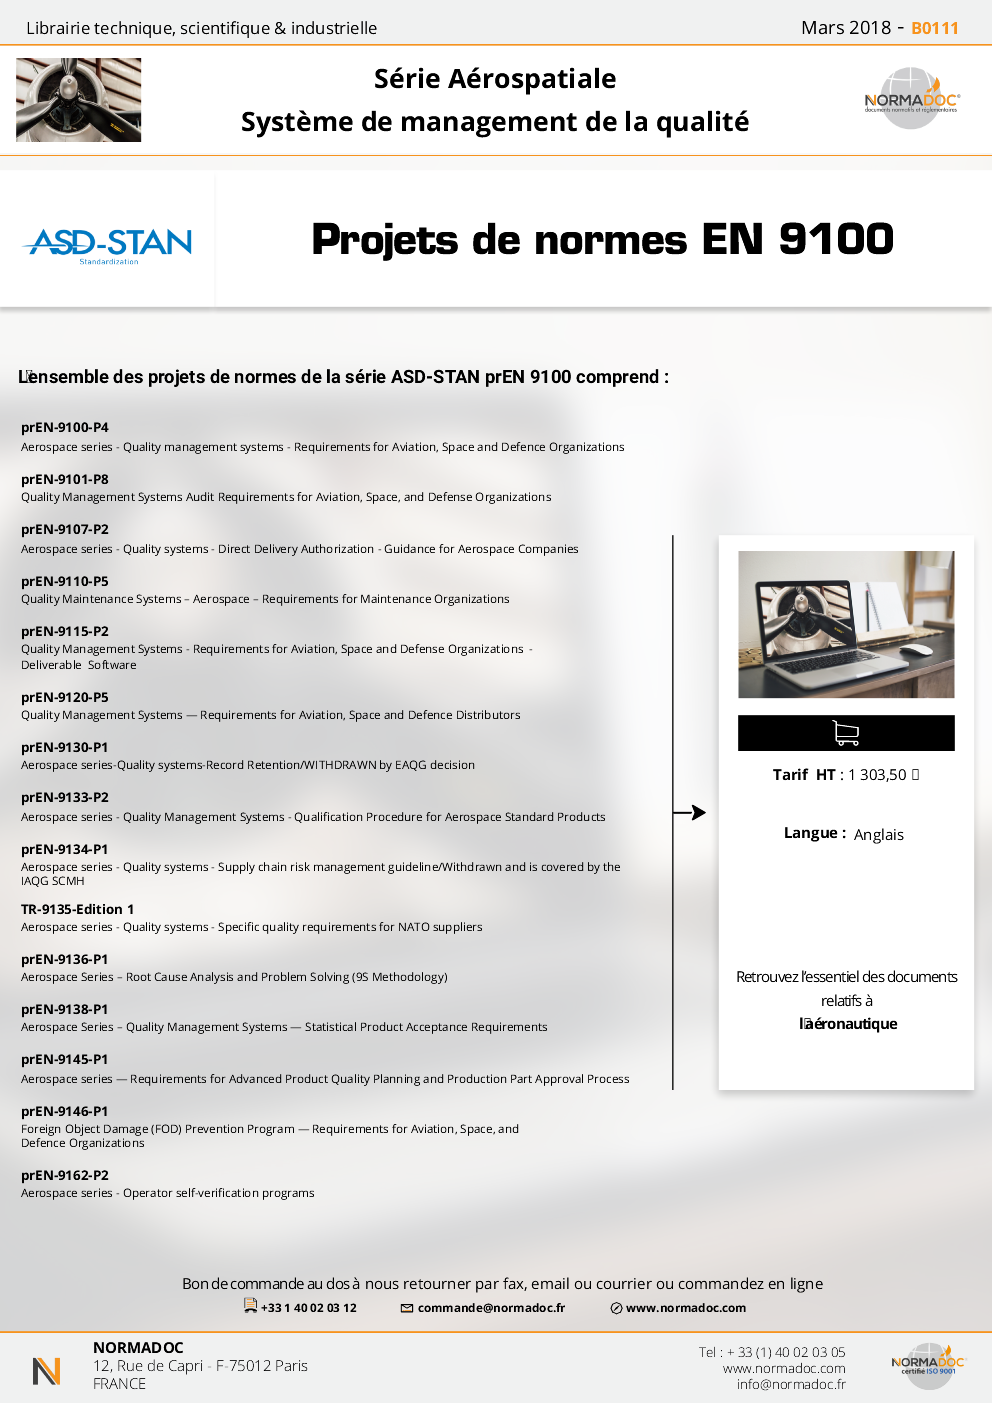 Projets de normes EN 9100